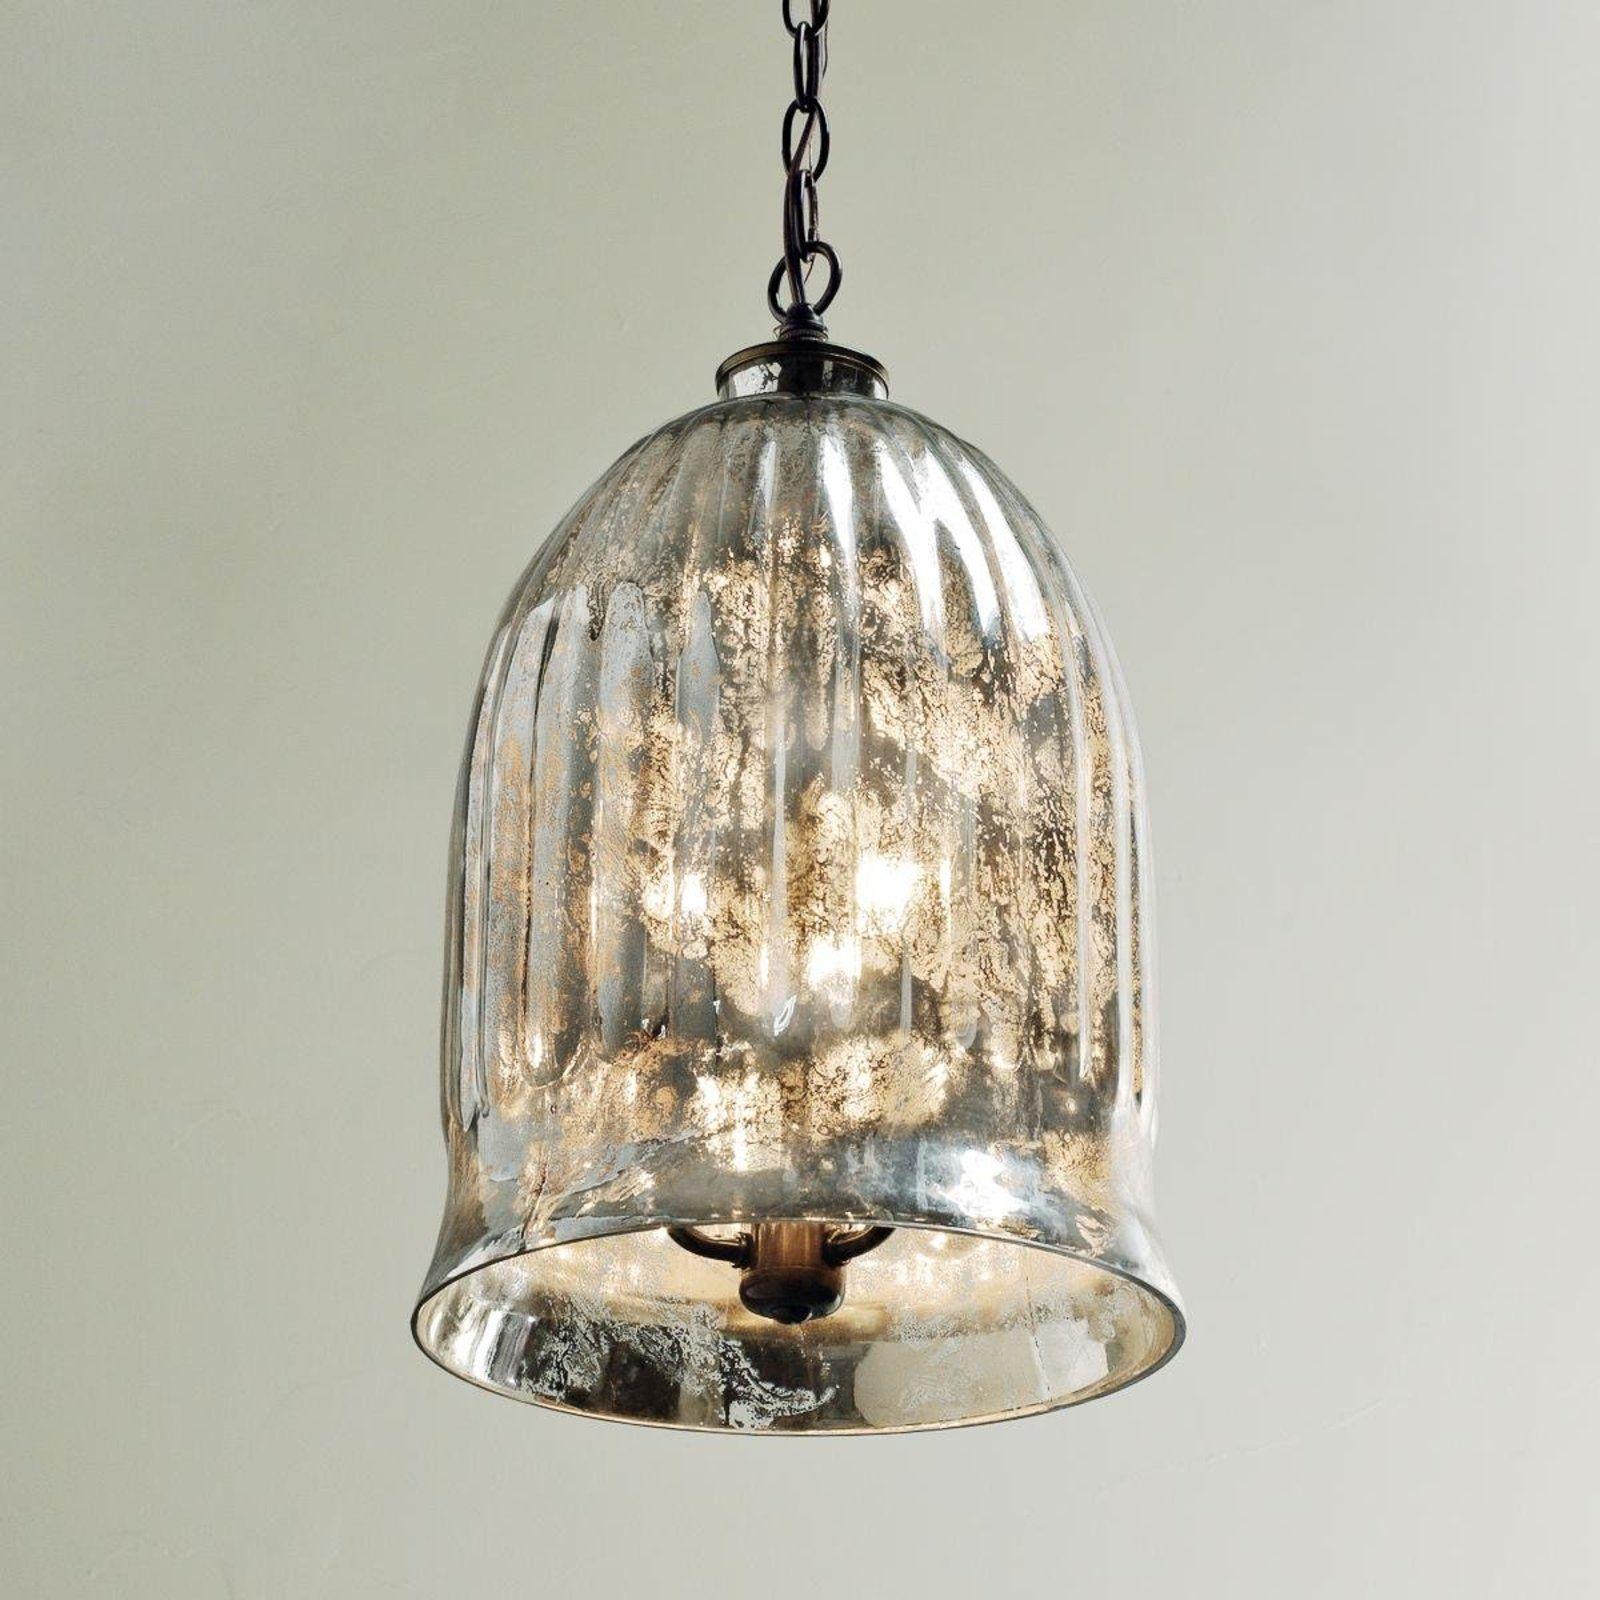 Antique Mirror Bell Pendant Lantern Bronze Mercury Glass Pendant Light Antique Mirror Lantern Pendant